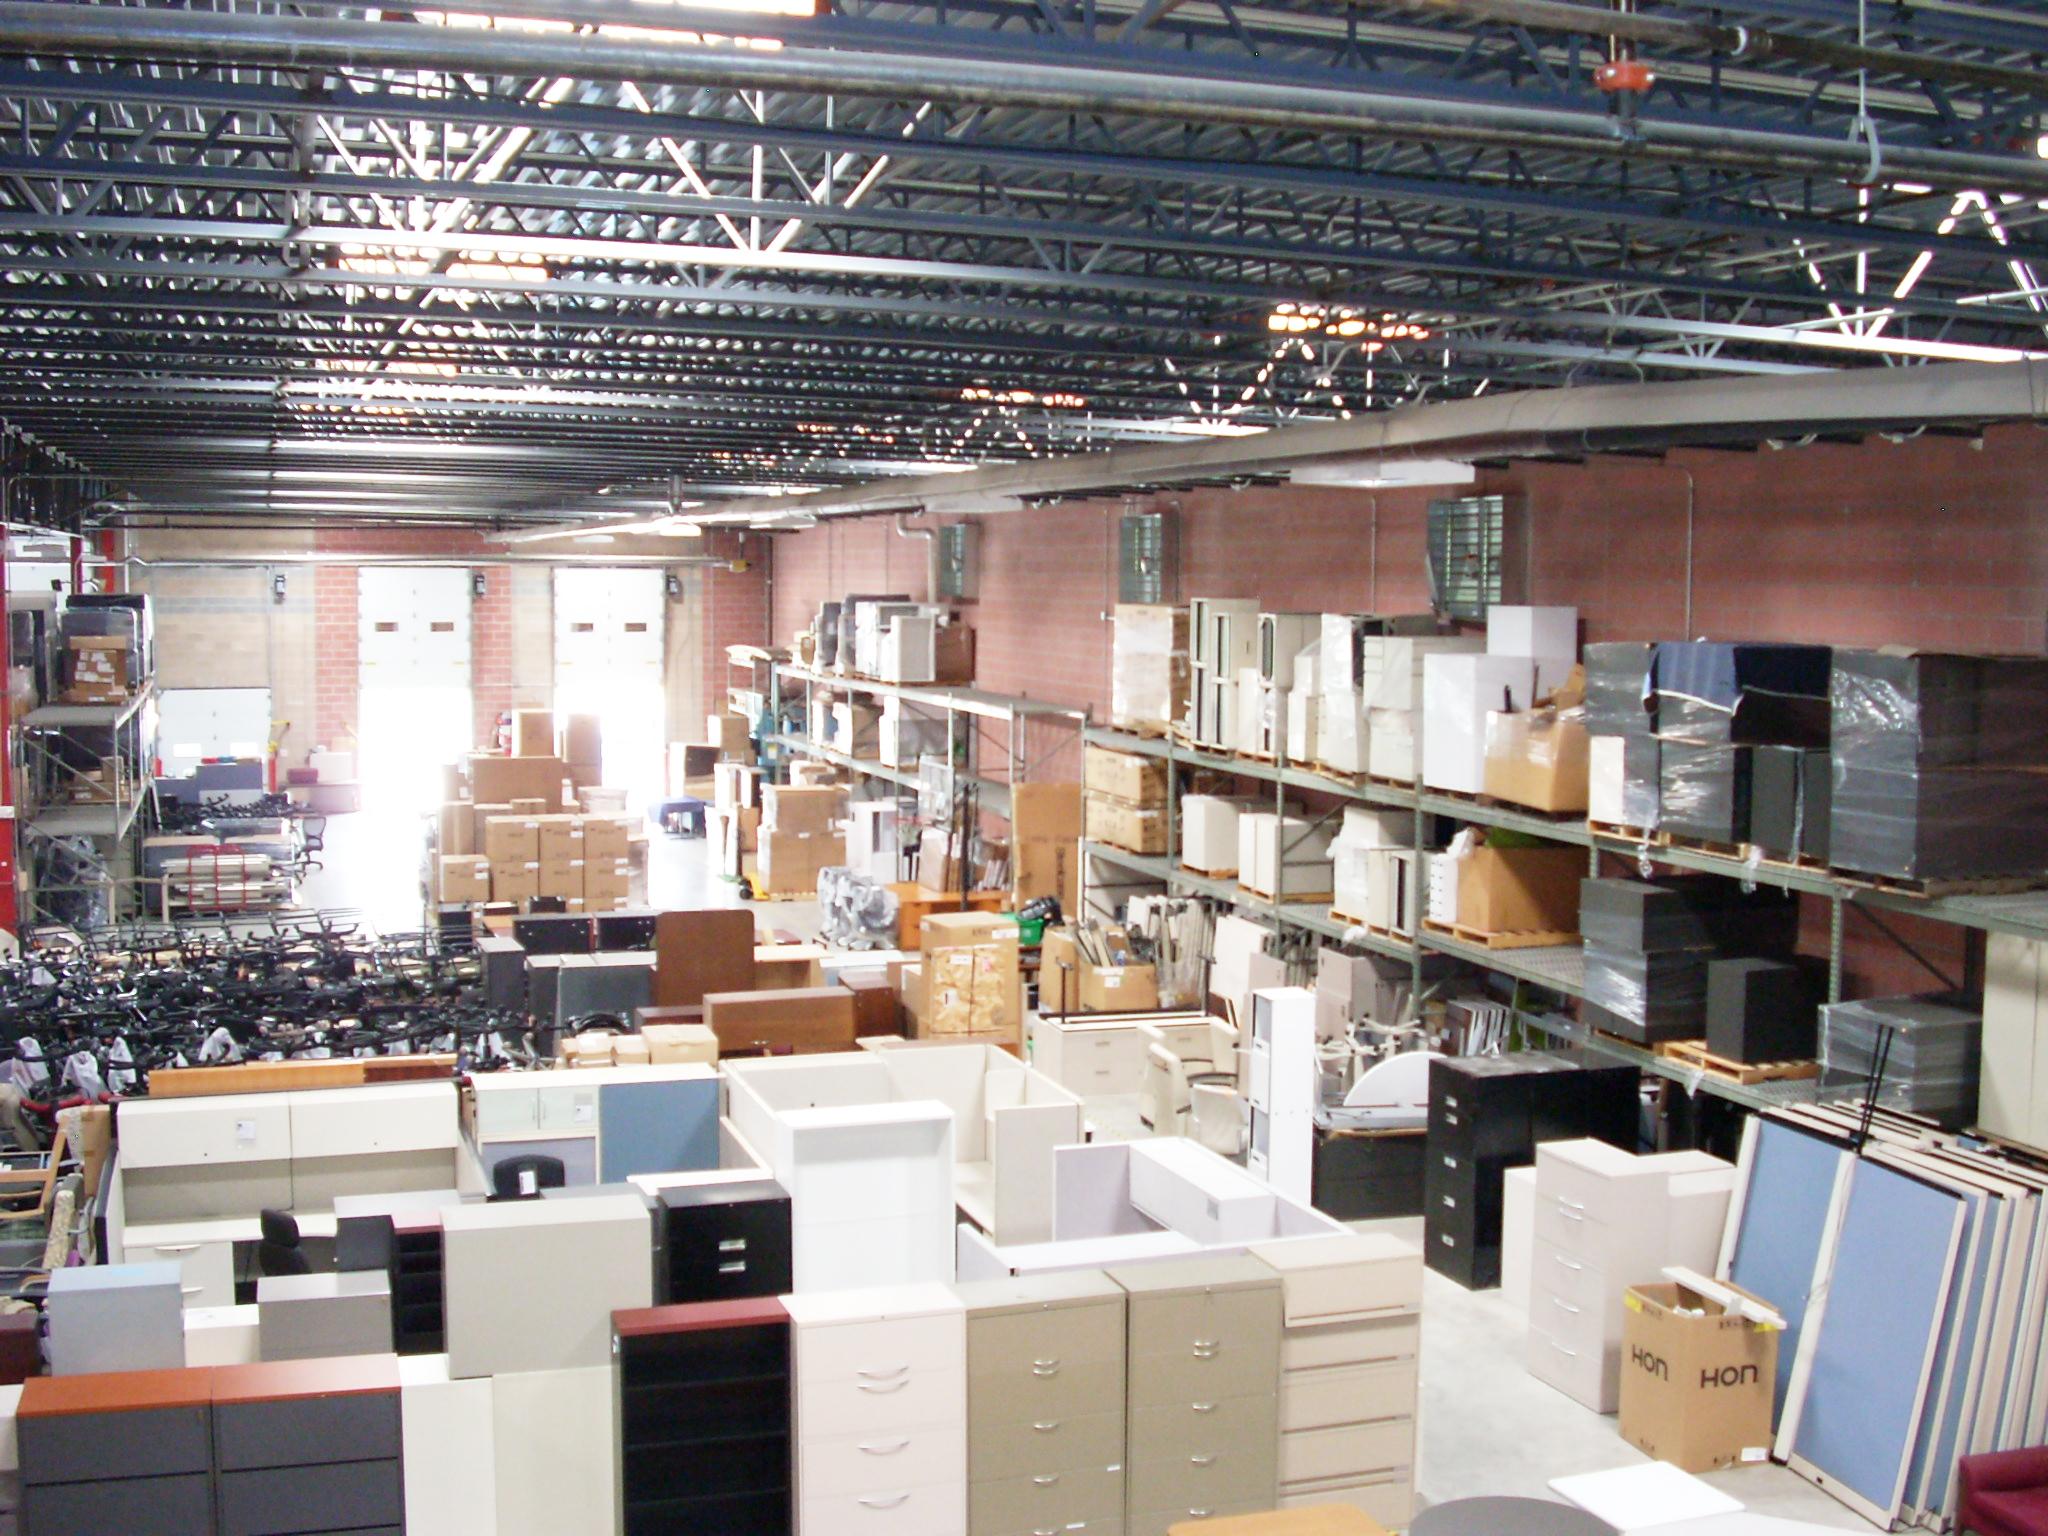 OSI Hag. Building, Trucks & Warehouse 035.JPG